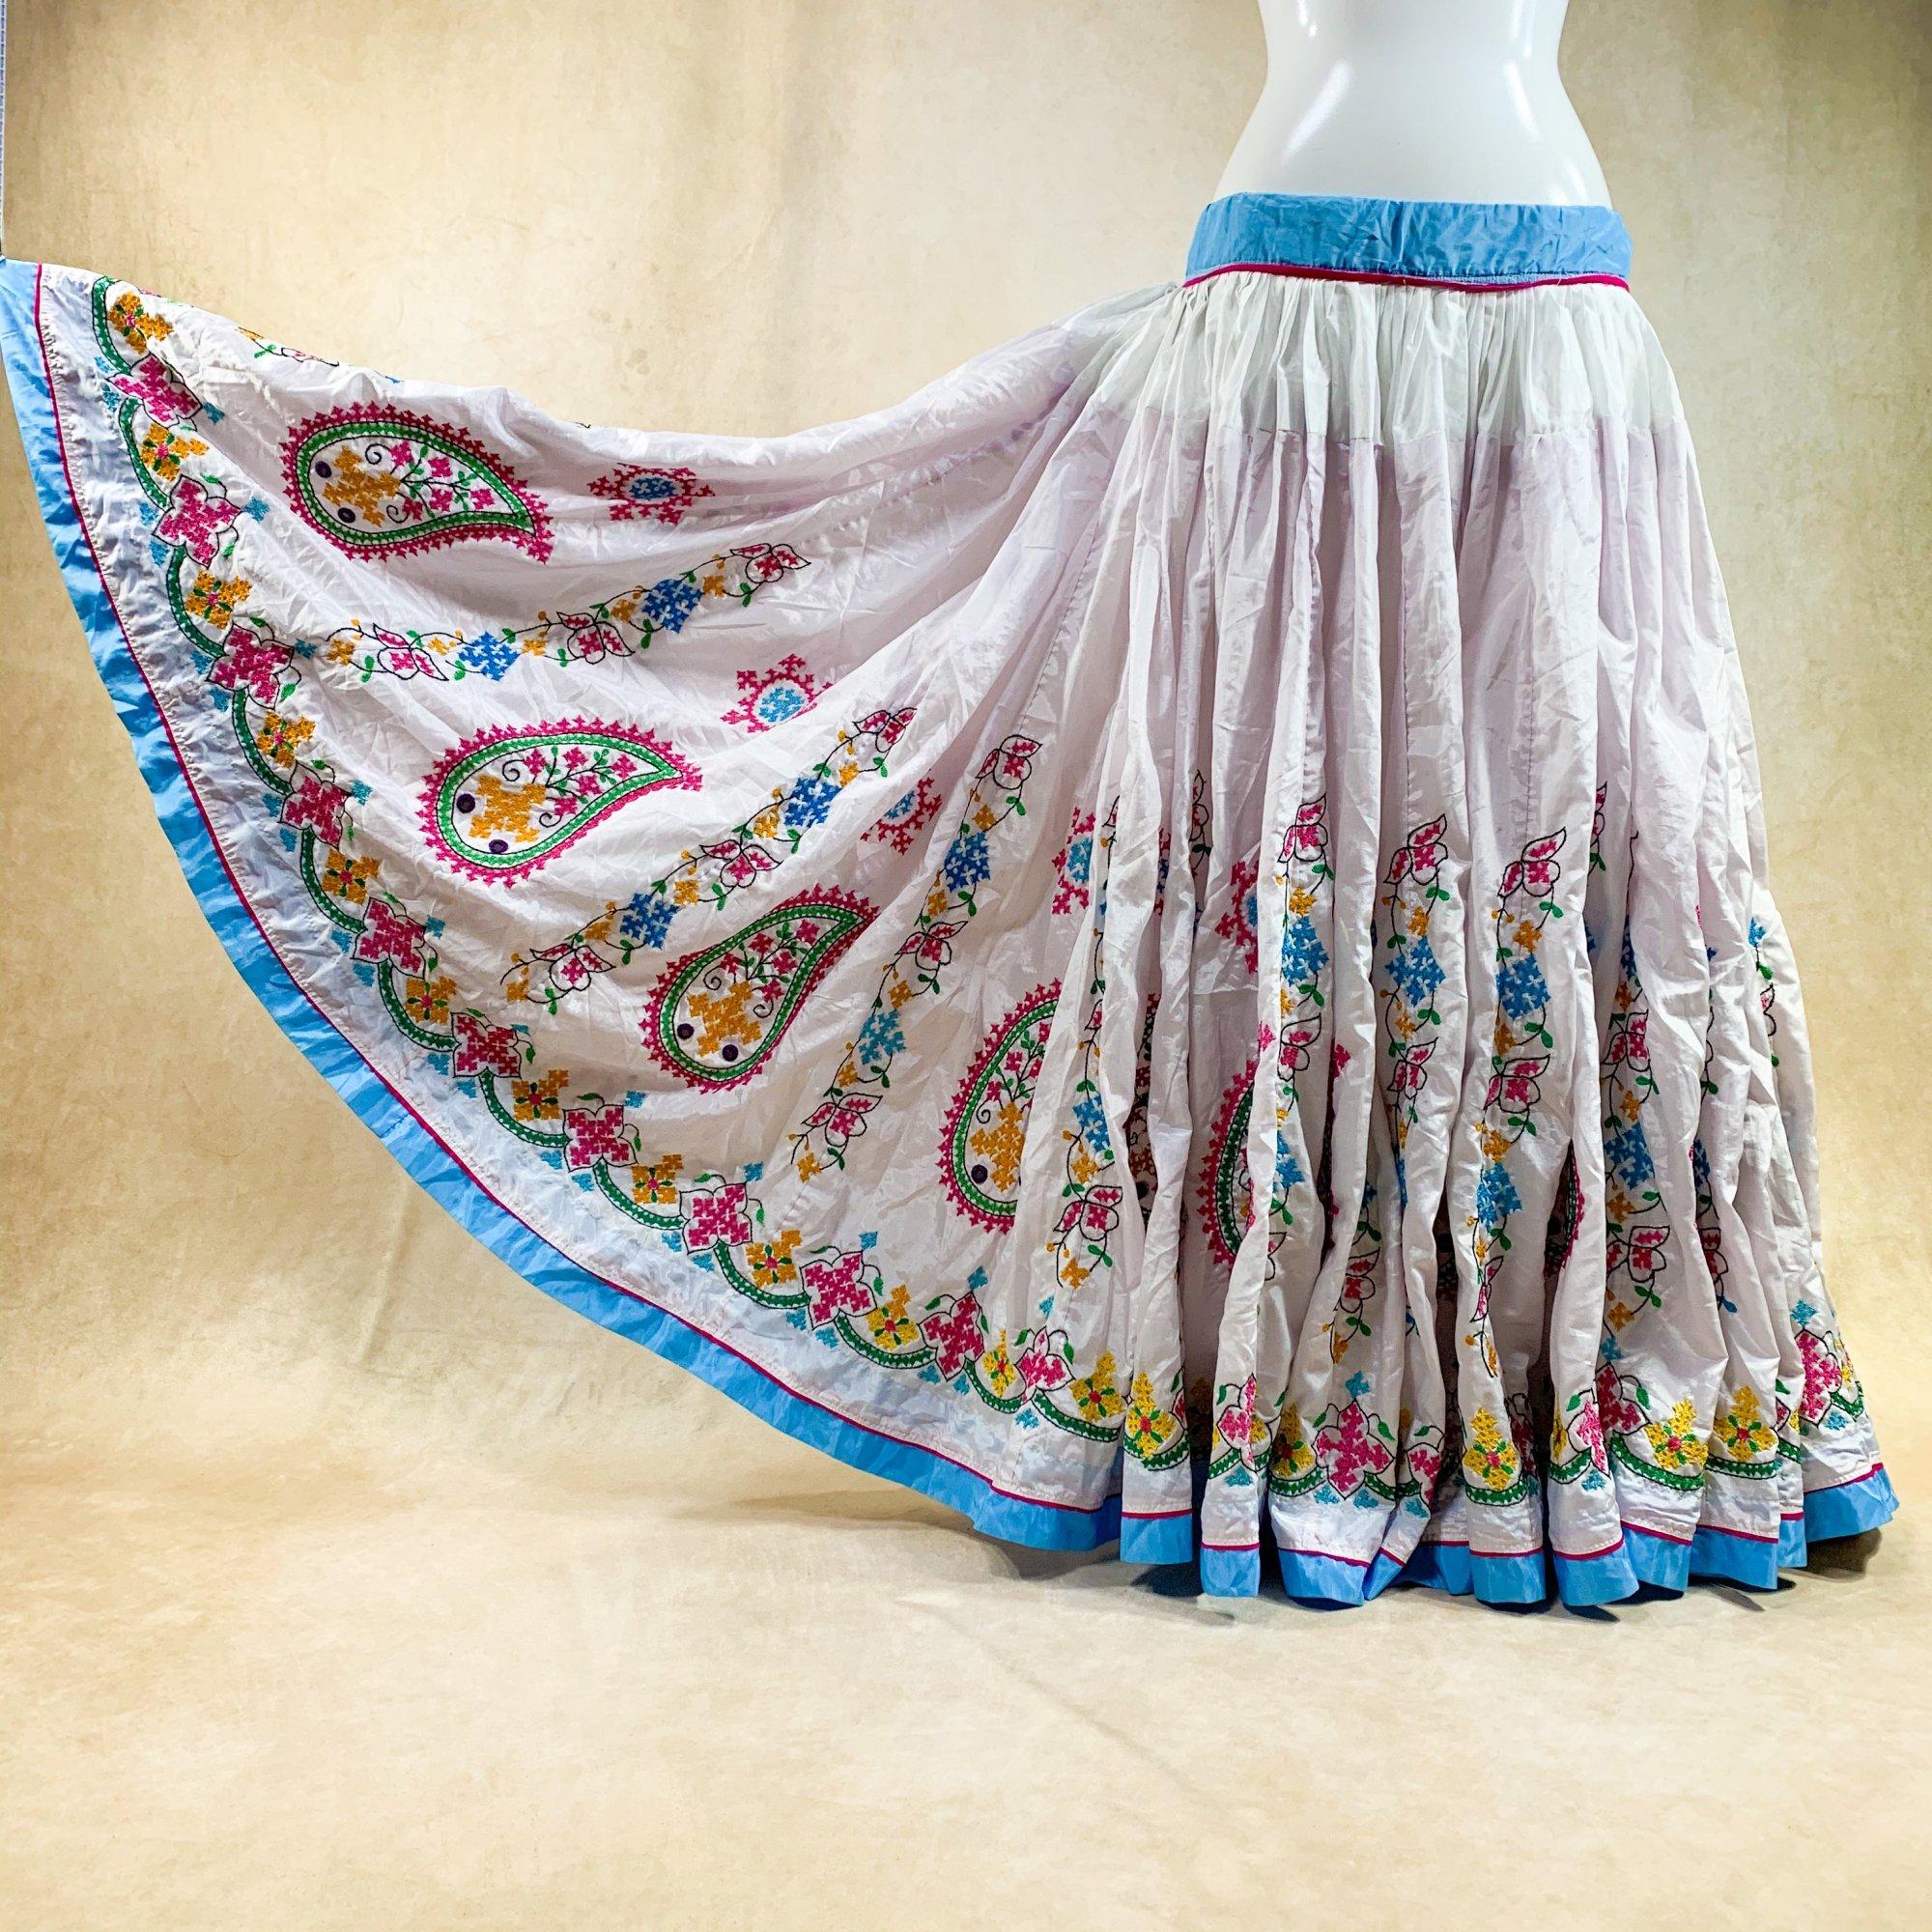 <img class='new_mark_img1' src='https://img.shop-pro.jp/img/new/icons61.gif' style='border:none;display:inline;margin:0px;padding:0px;width:auto;' />Kuchi Gypsy skirt #83 *vintage* カッチ刺繍スカート ≪WHITE≫